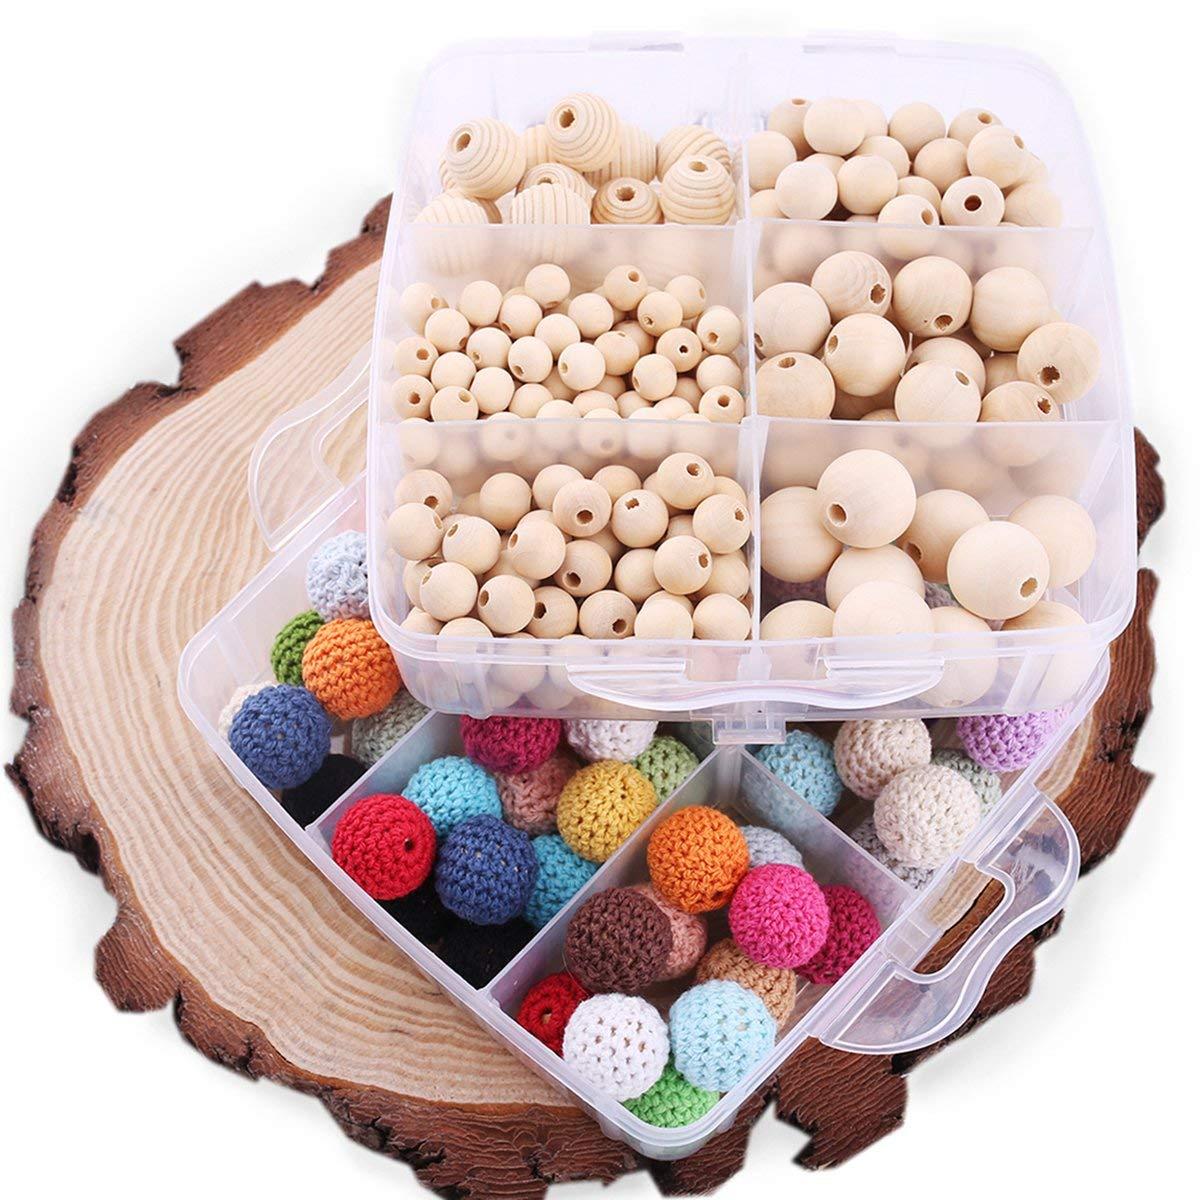 DIY Organic Teething Beads Crochet Beads BPA Free Maple Wooden Teether DIY Jewelry Diy Teether Kit Waldorf Toys Natural Environmental Toys Chewable Teether Beads DIY Kit For Baby Organic Birthday Gift